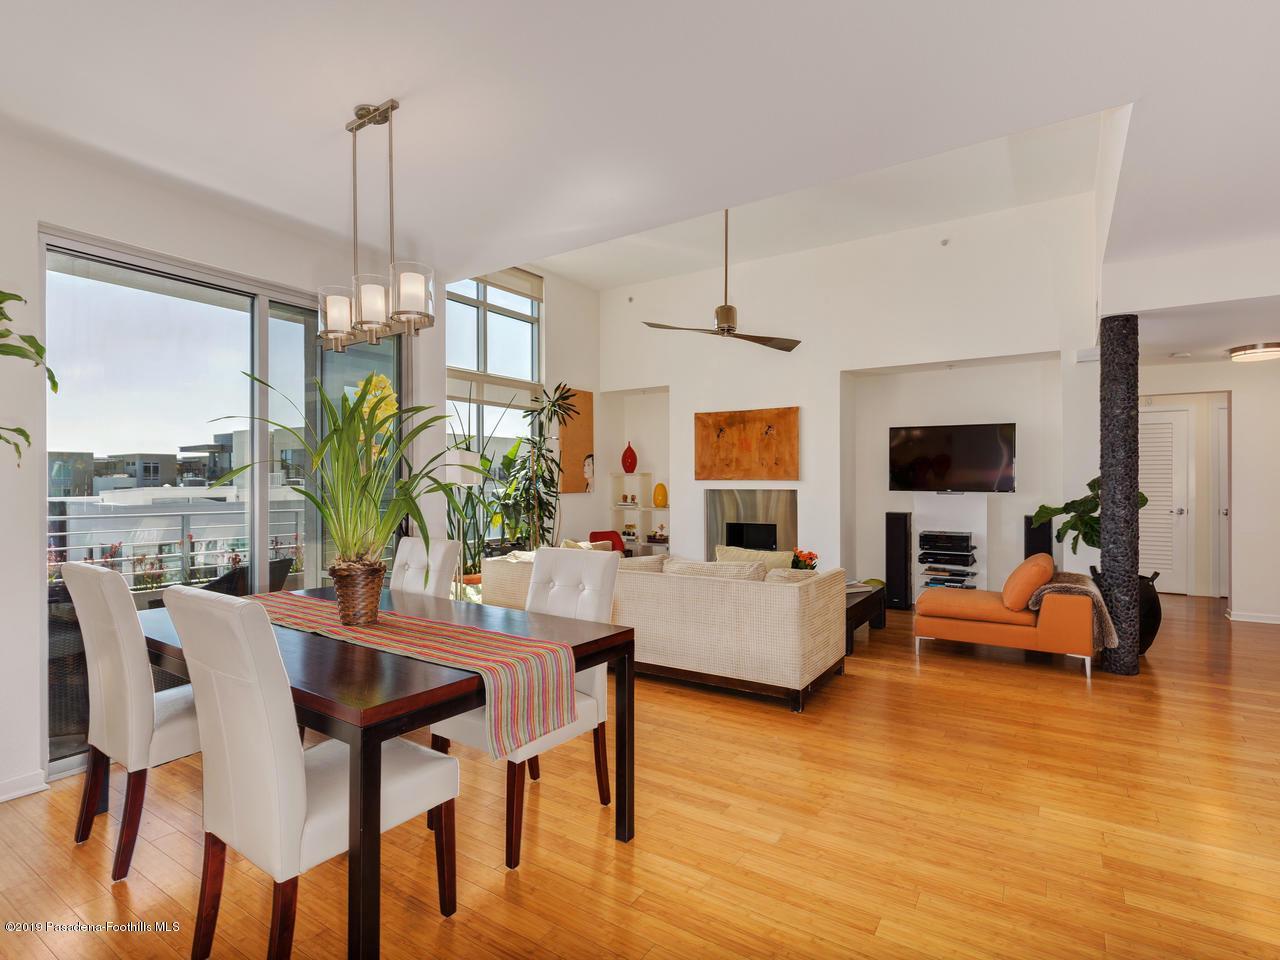 111 DE LACEY, Pasadena, CA 91105 - Living/Dining Area